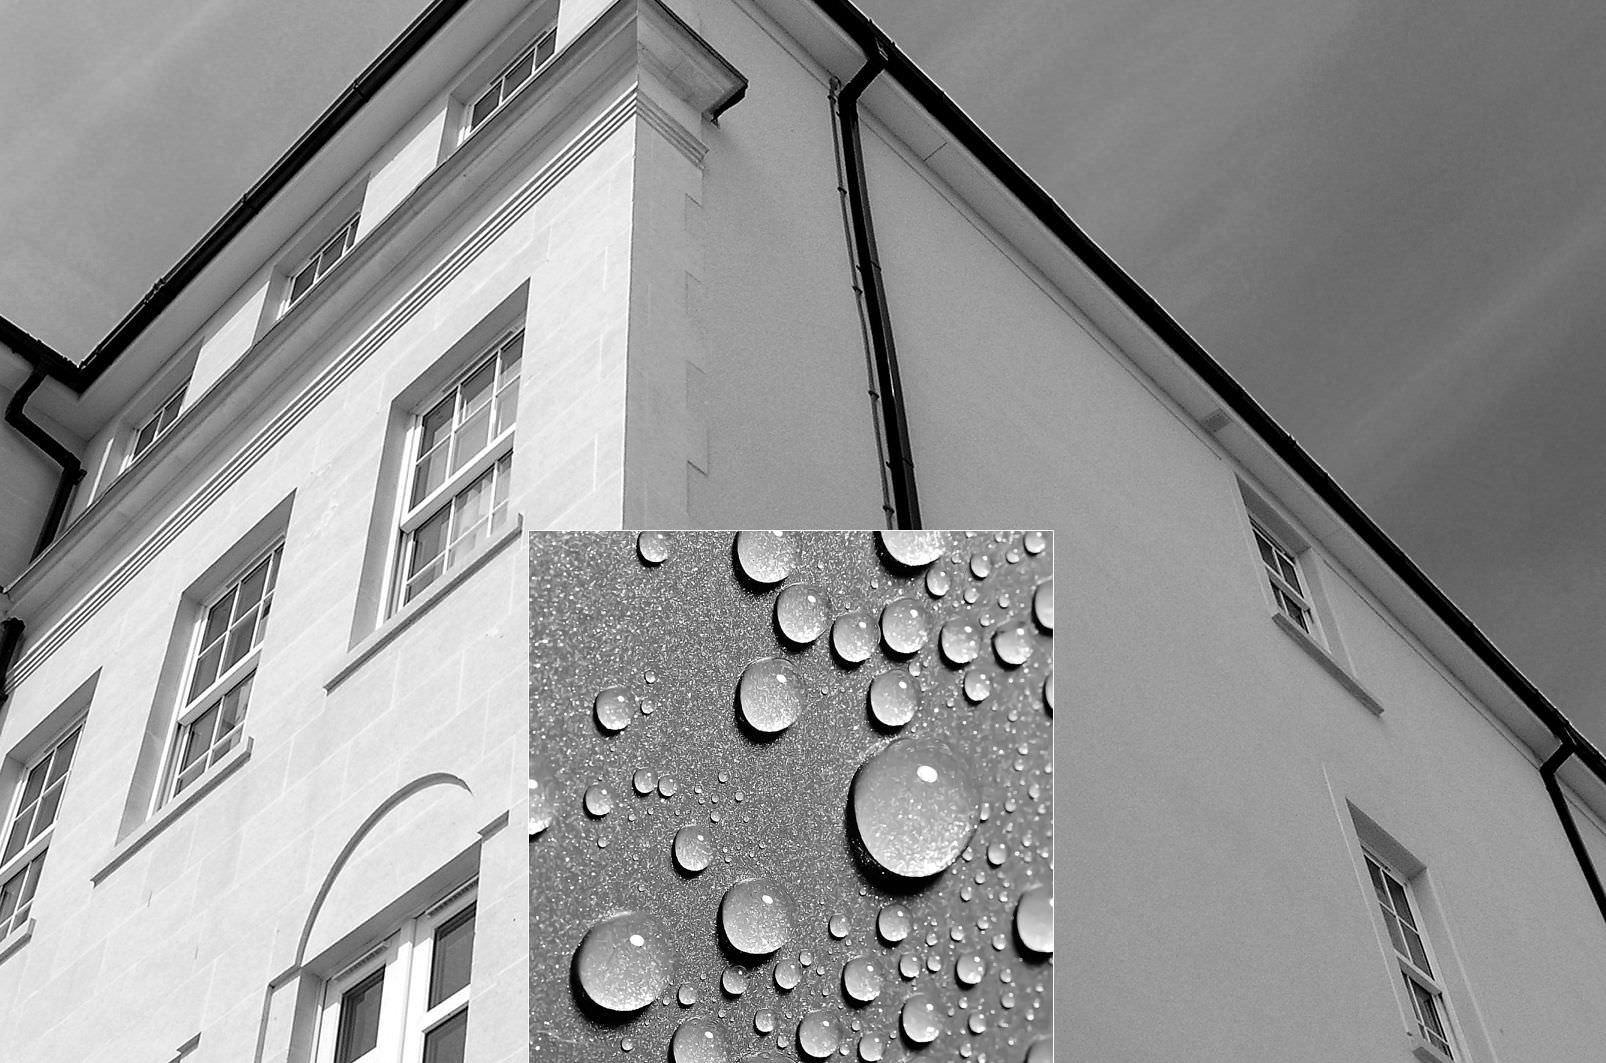 Pintura de silicona su uso para proteger muros exteriores for Arcones de resina para exterior